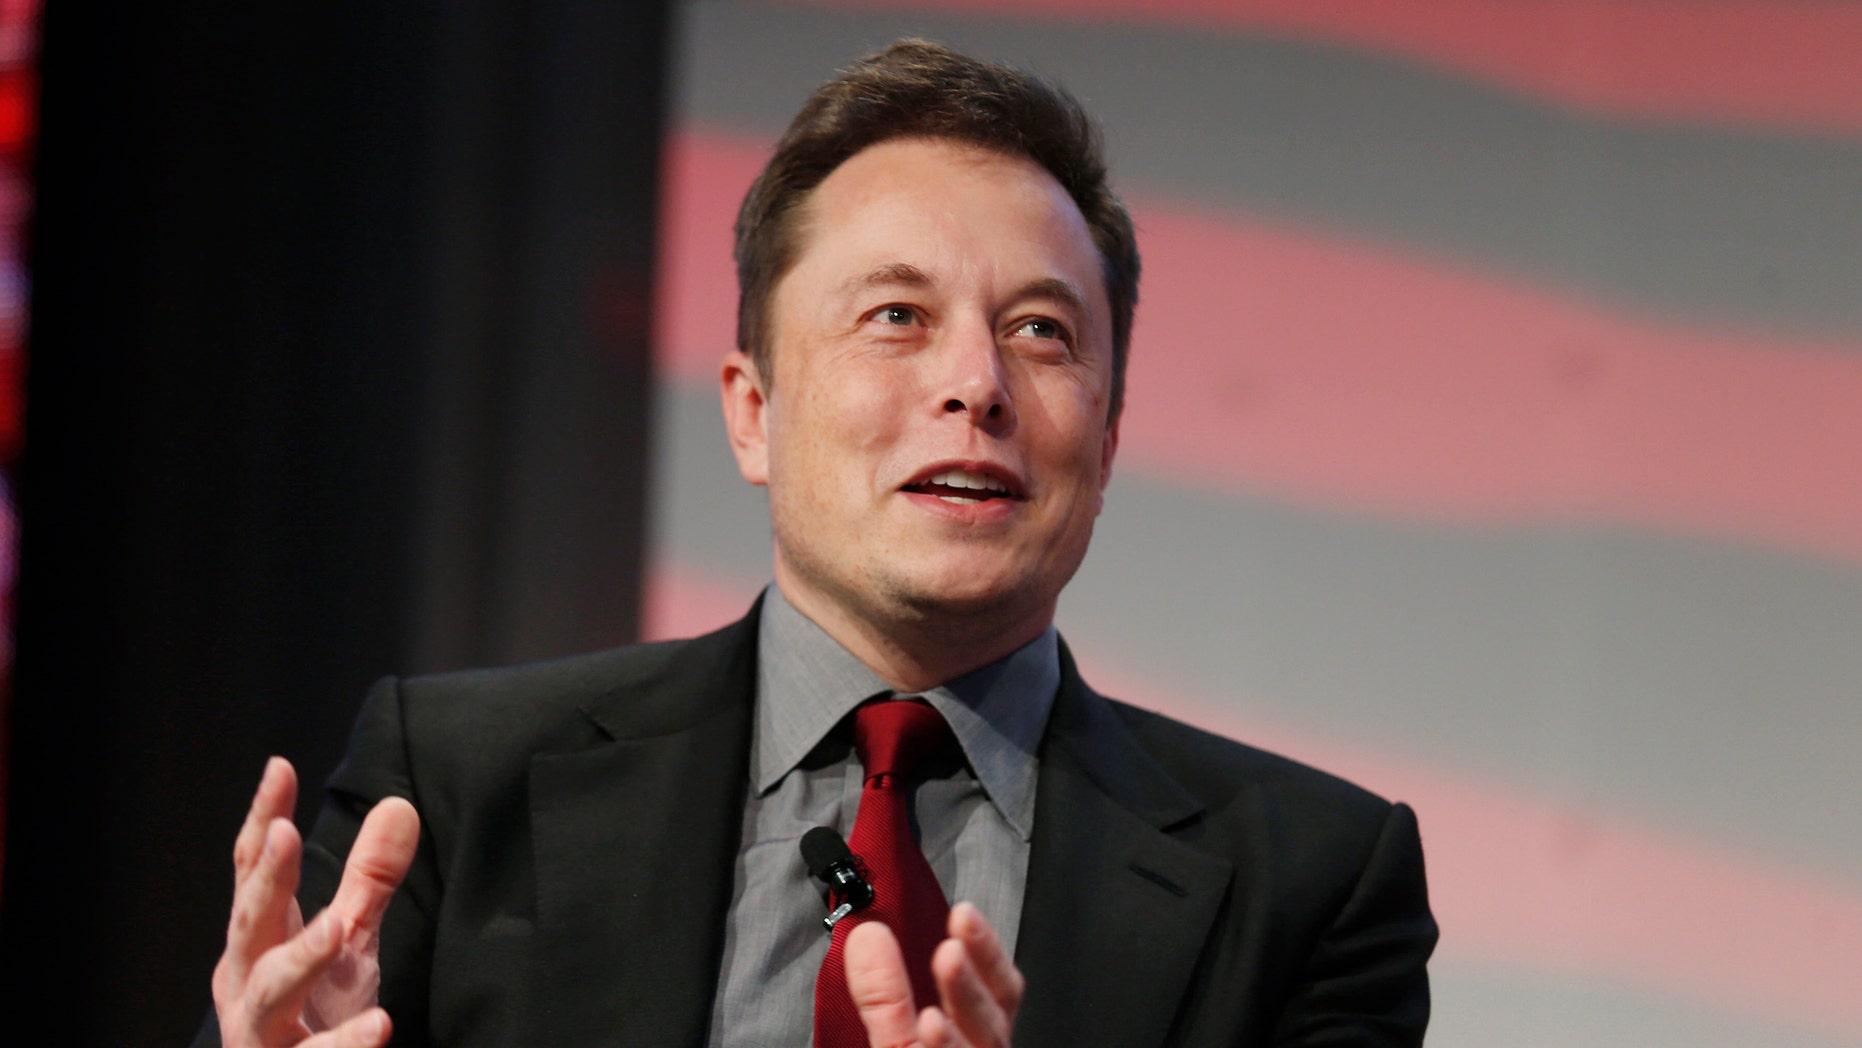 Tesla Motors CEO Elon Musk talks at the Automotive World News Congress at the Renaissance Center in Detroit, Michigan, Jan.13, 2015.